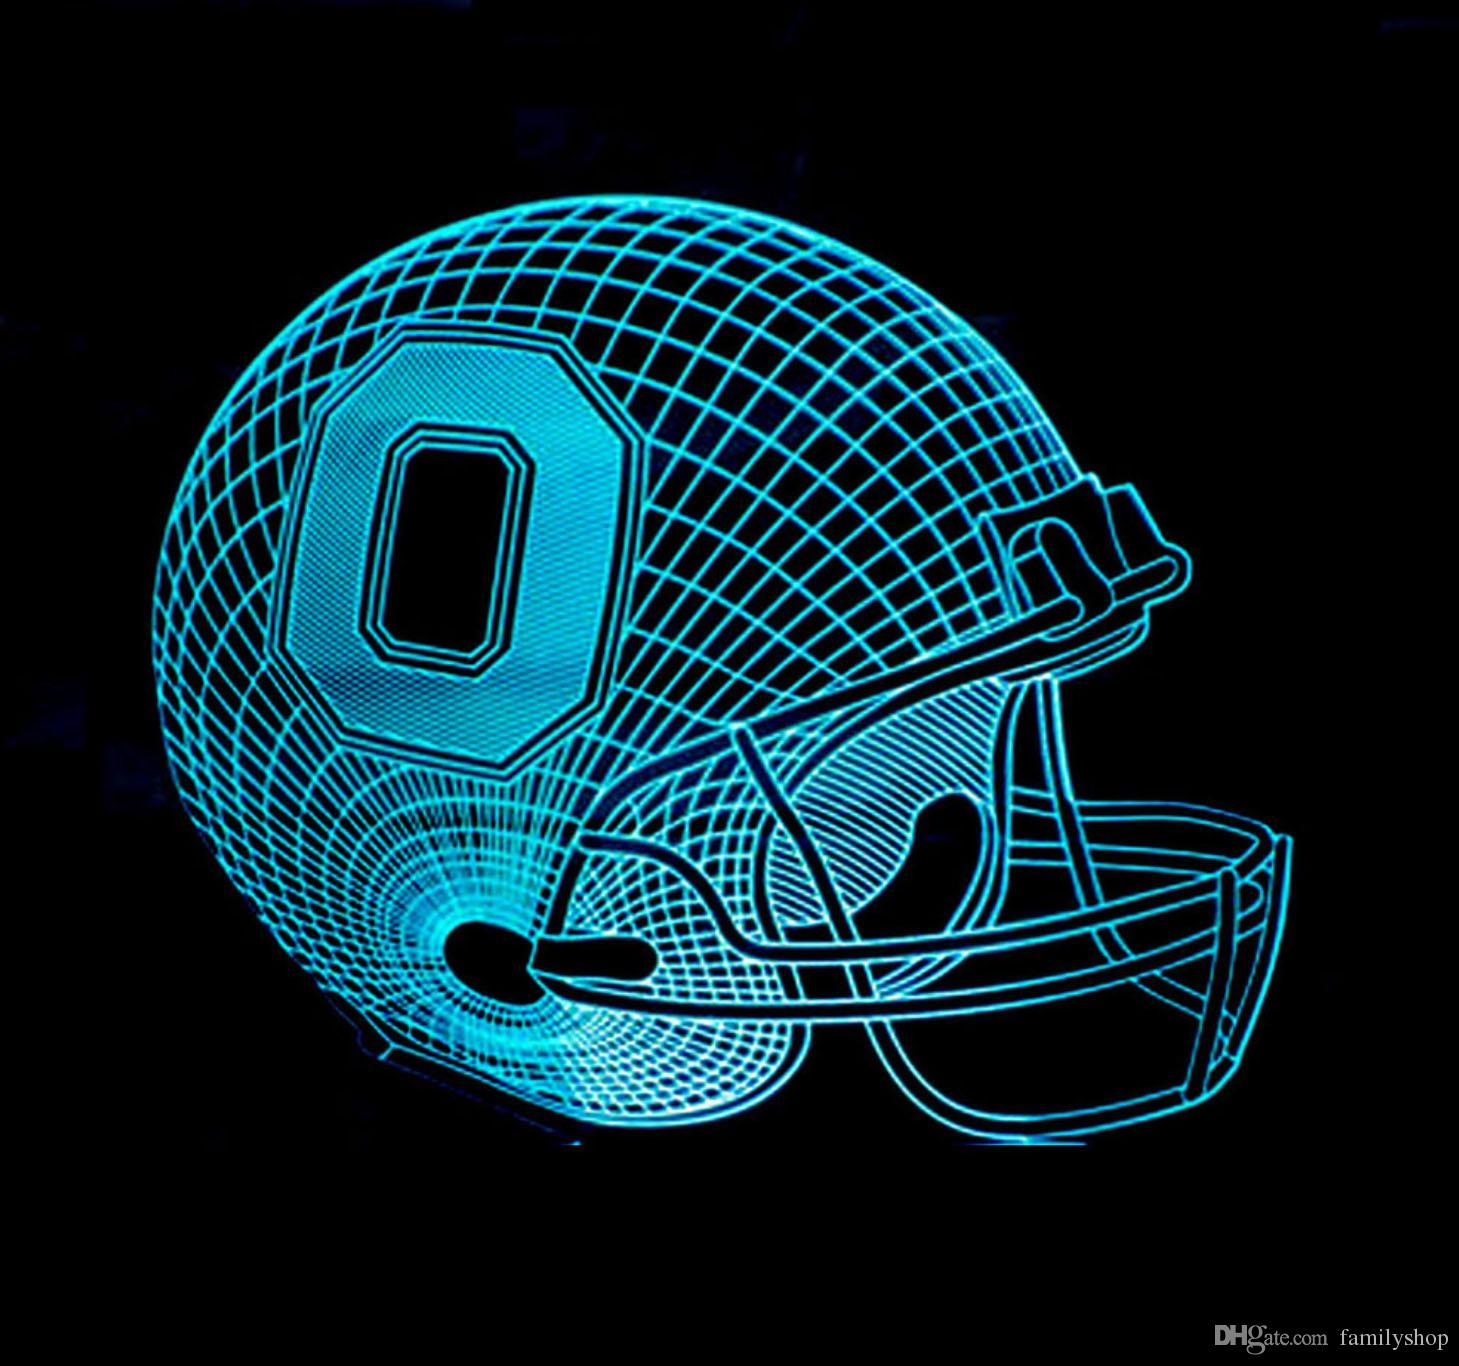 2018 Baseball Fan 3D Night Light Ohio State Team Buckeyes